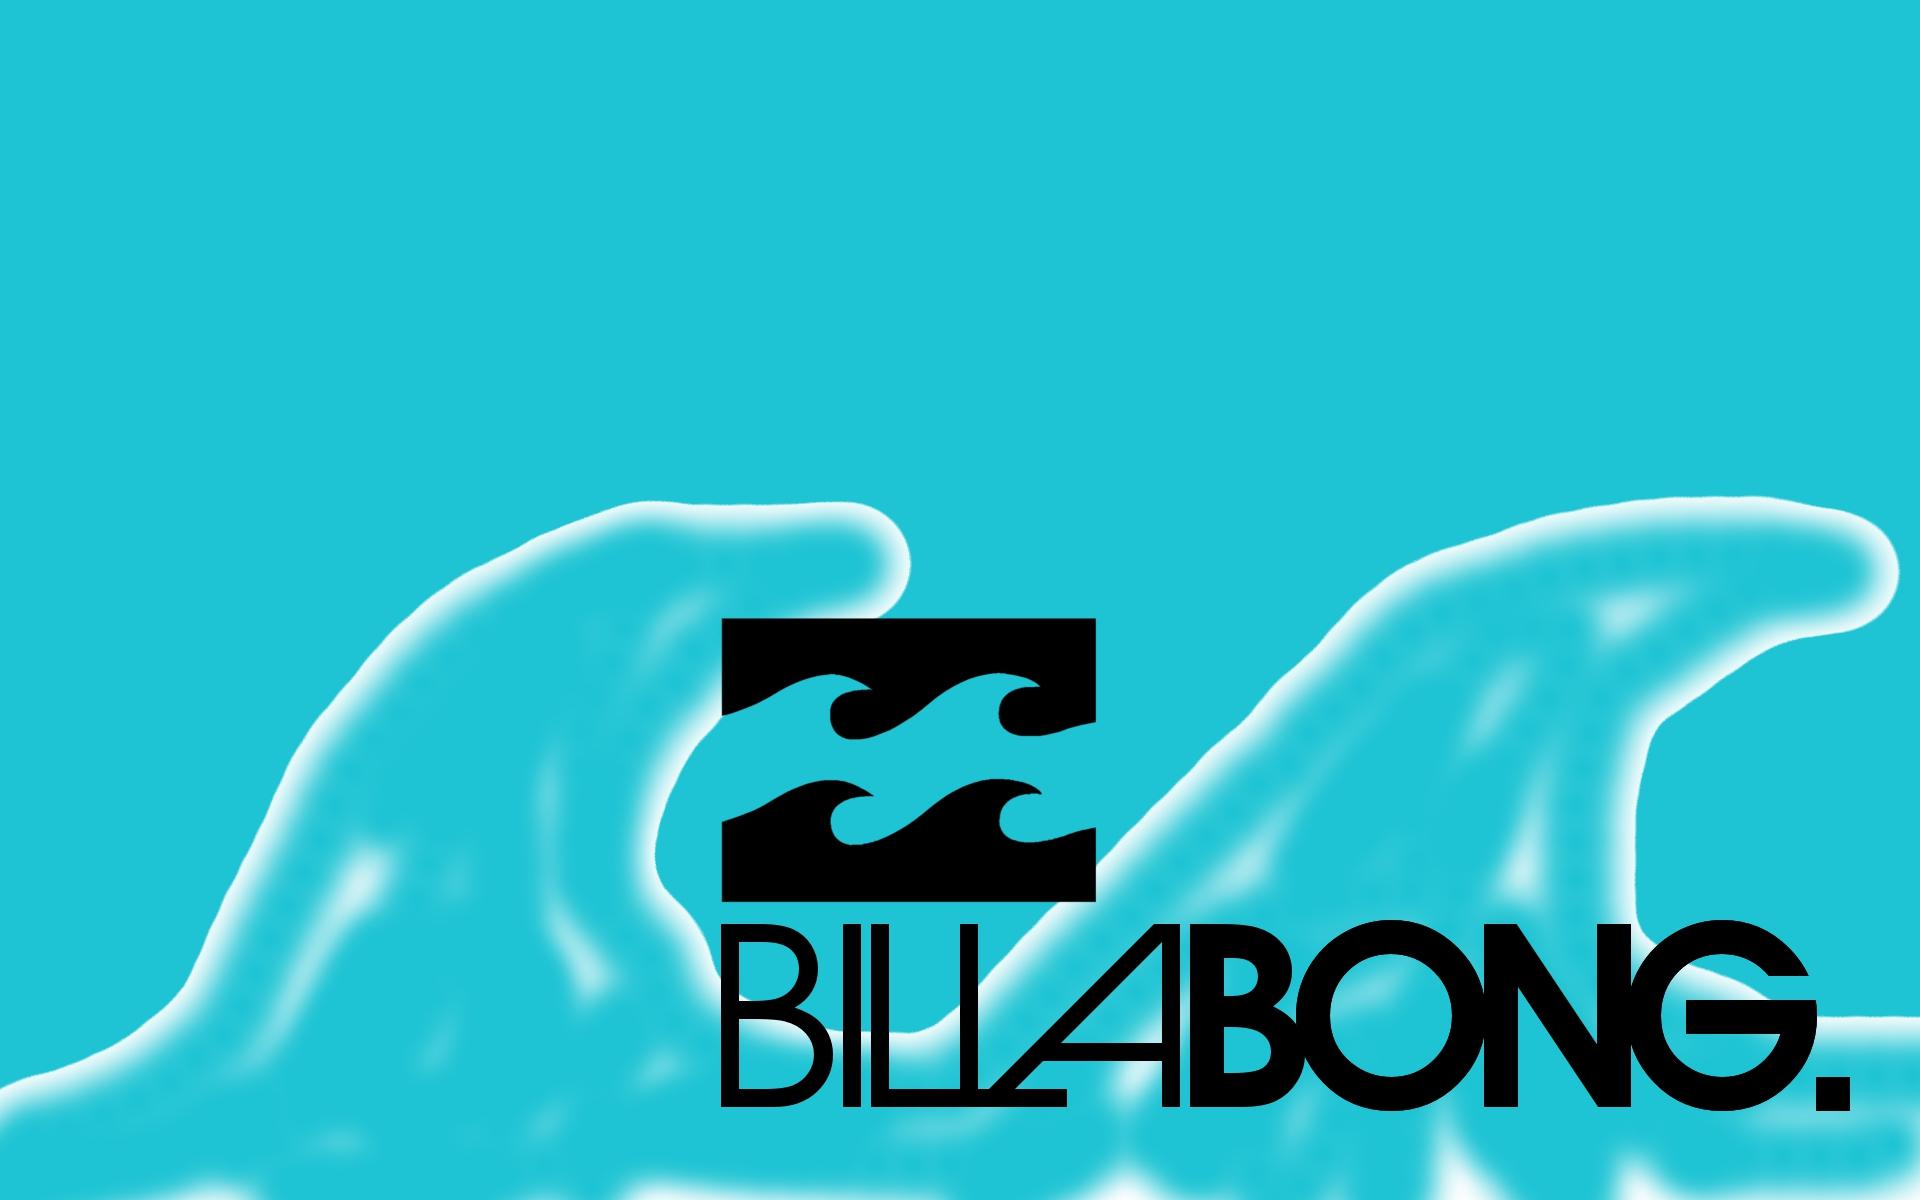 Billabong Logo On Blue Waves Background 1920x1200 WIDE Surfing 1920x1200